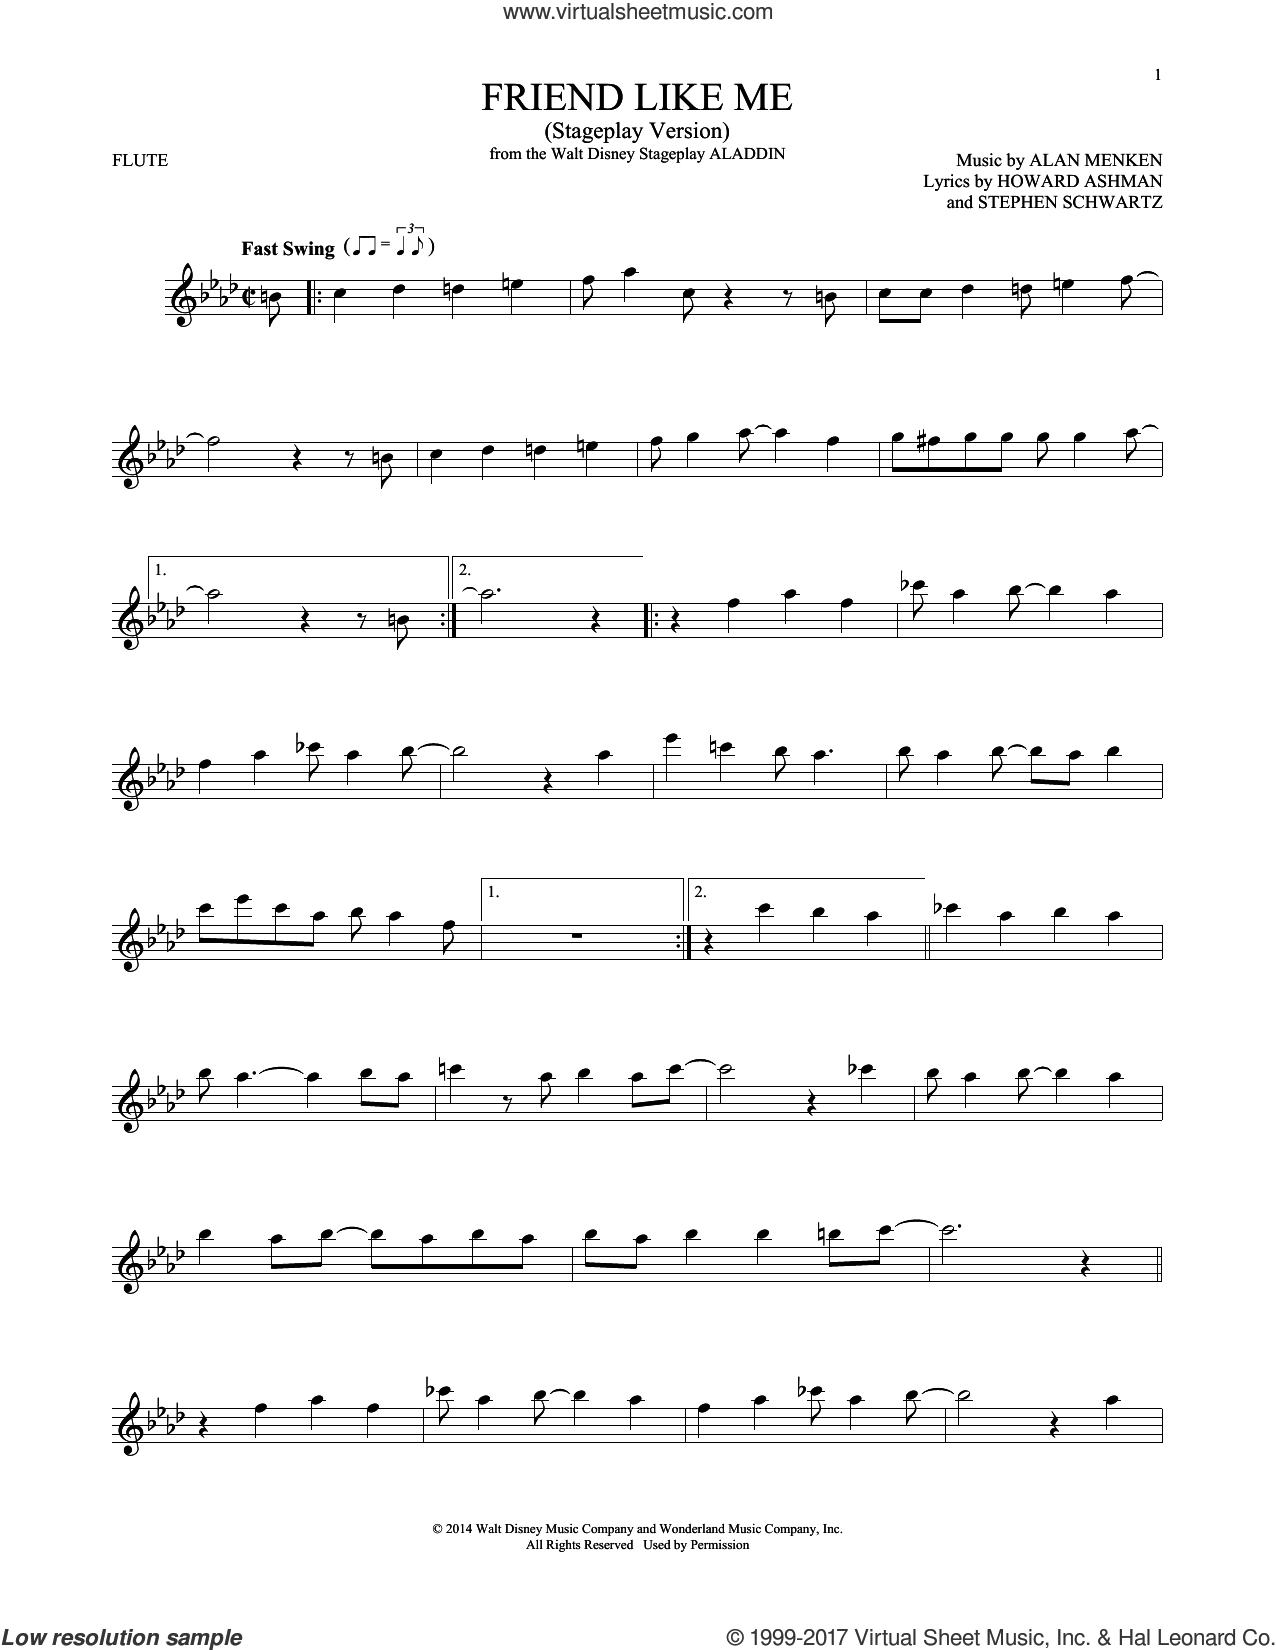 Friend Like Me (from Aladdin) (Stageplay Version) sheet music for flute solo by Alan Menken, Howard Ashman and Stephen Schwartz, intermediate skill level